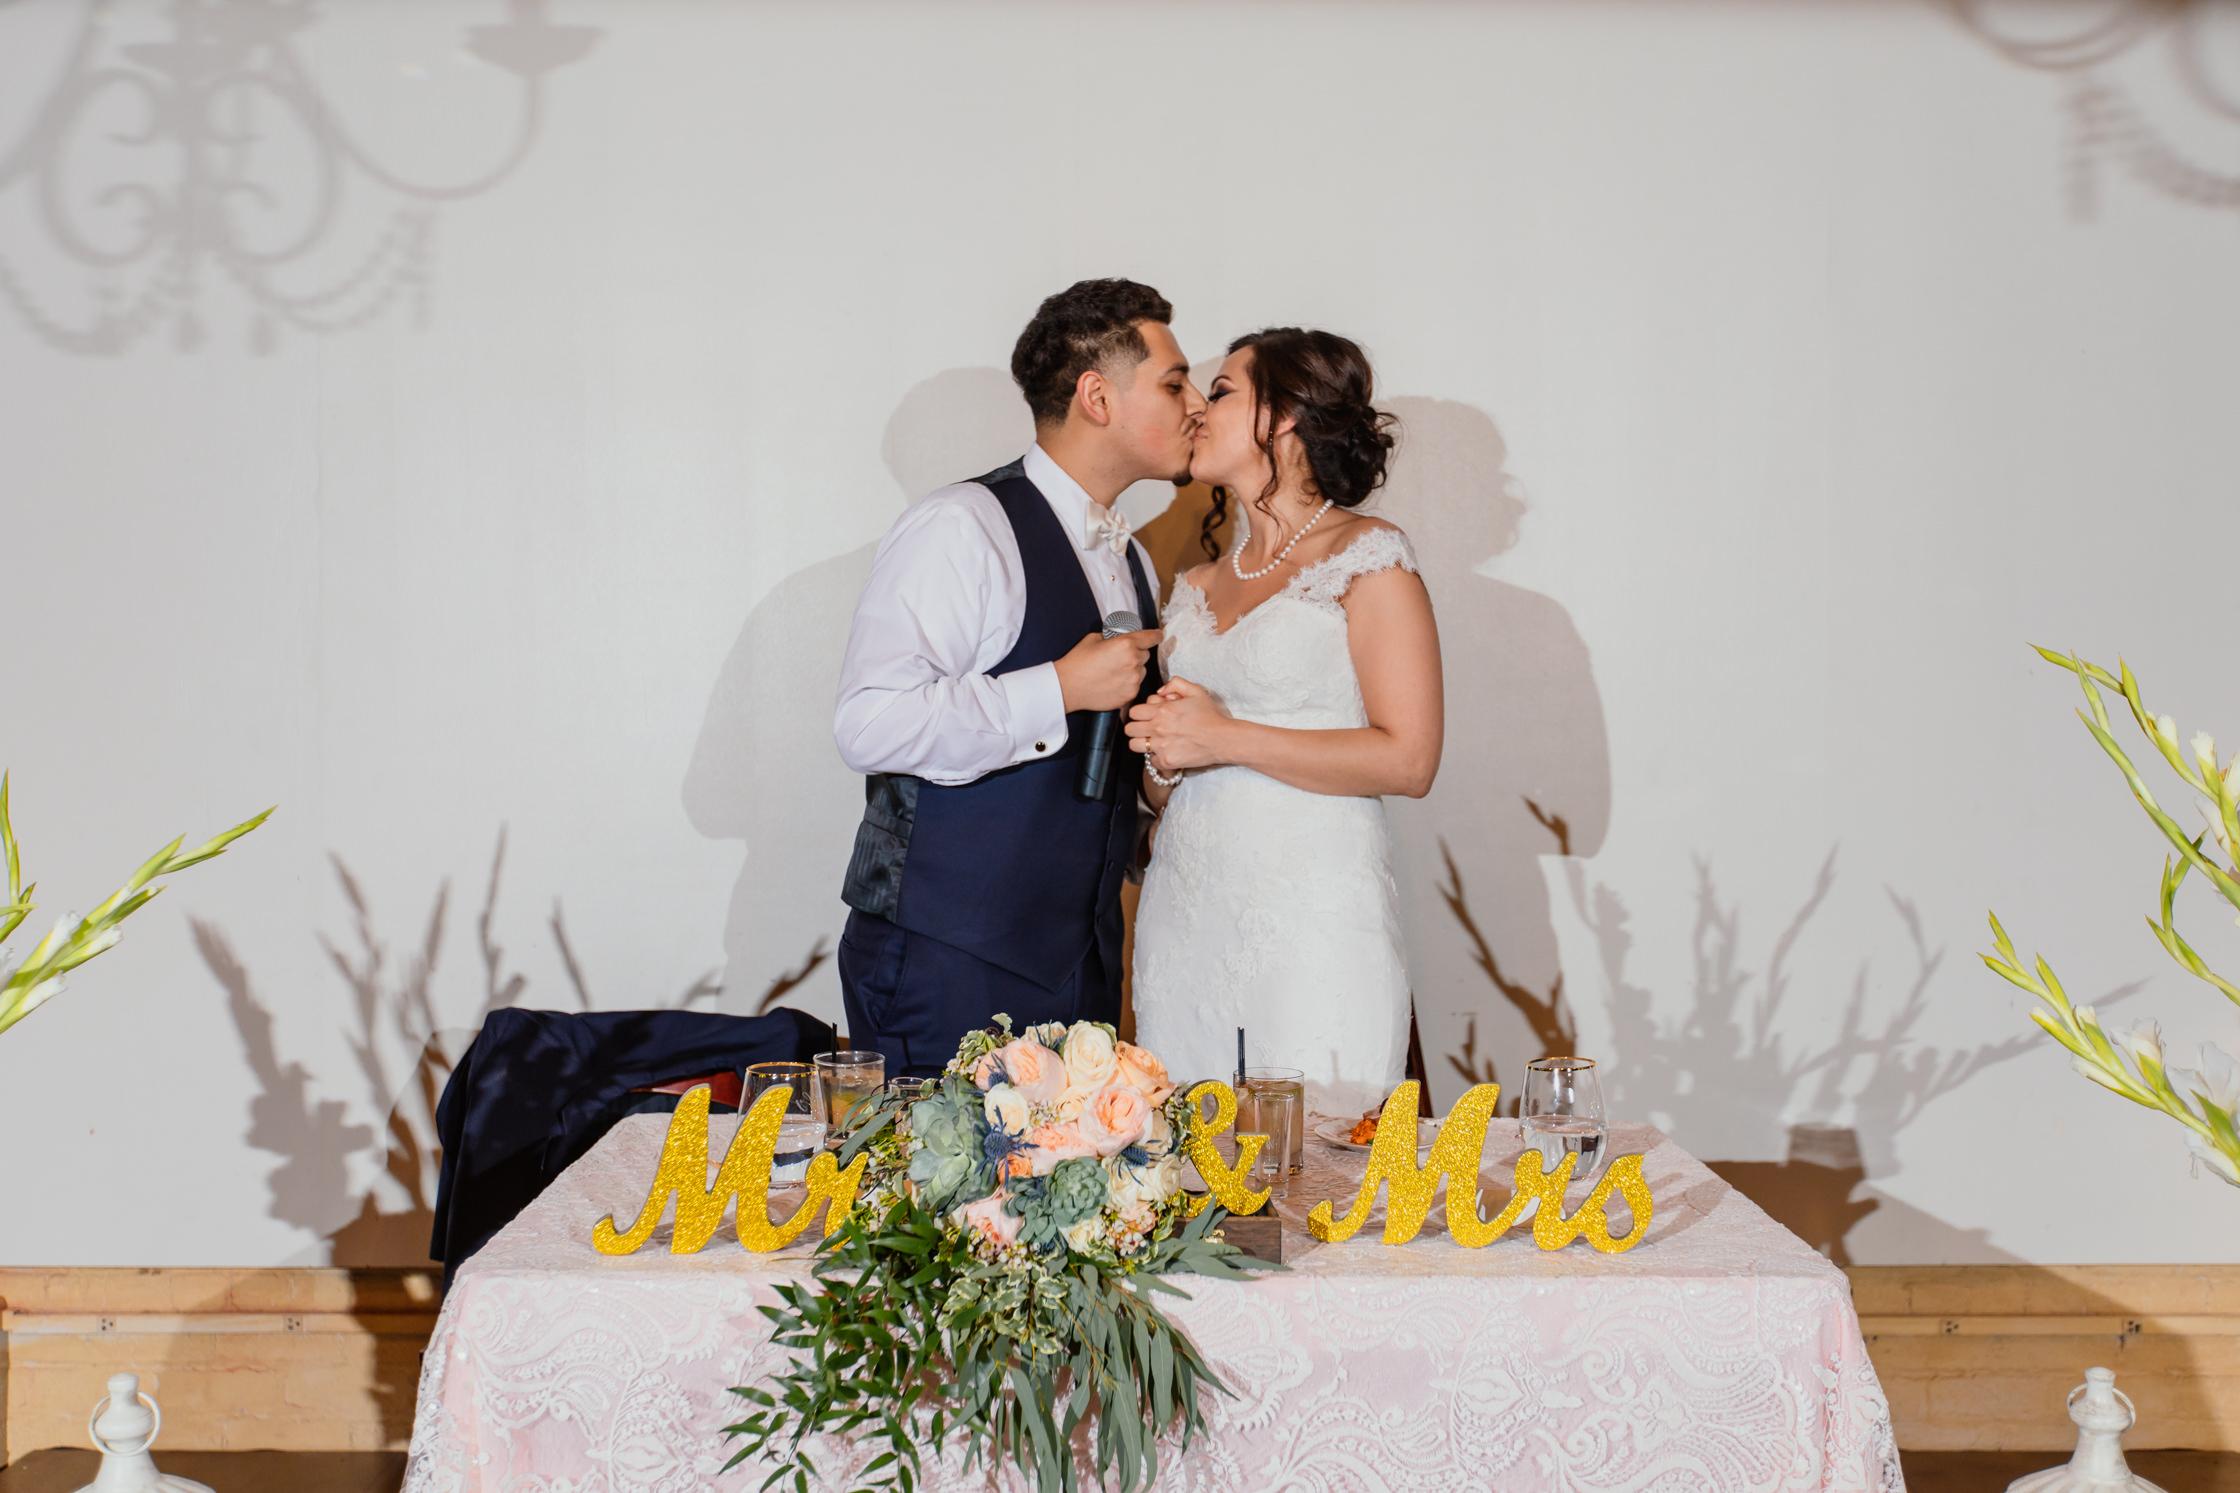 luis_joanna_wedding-100.jpg